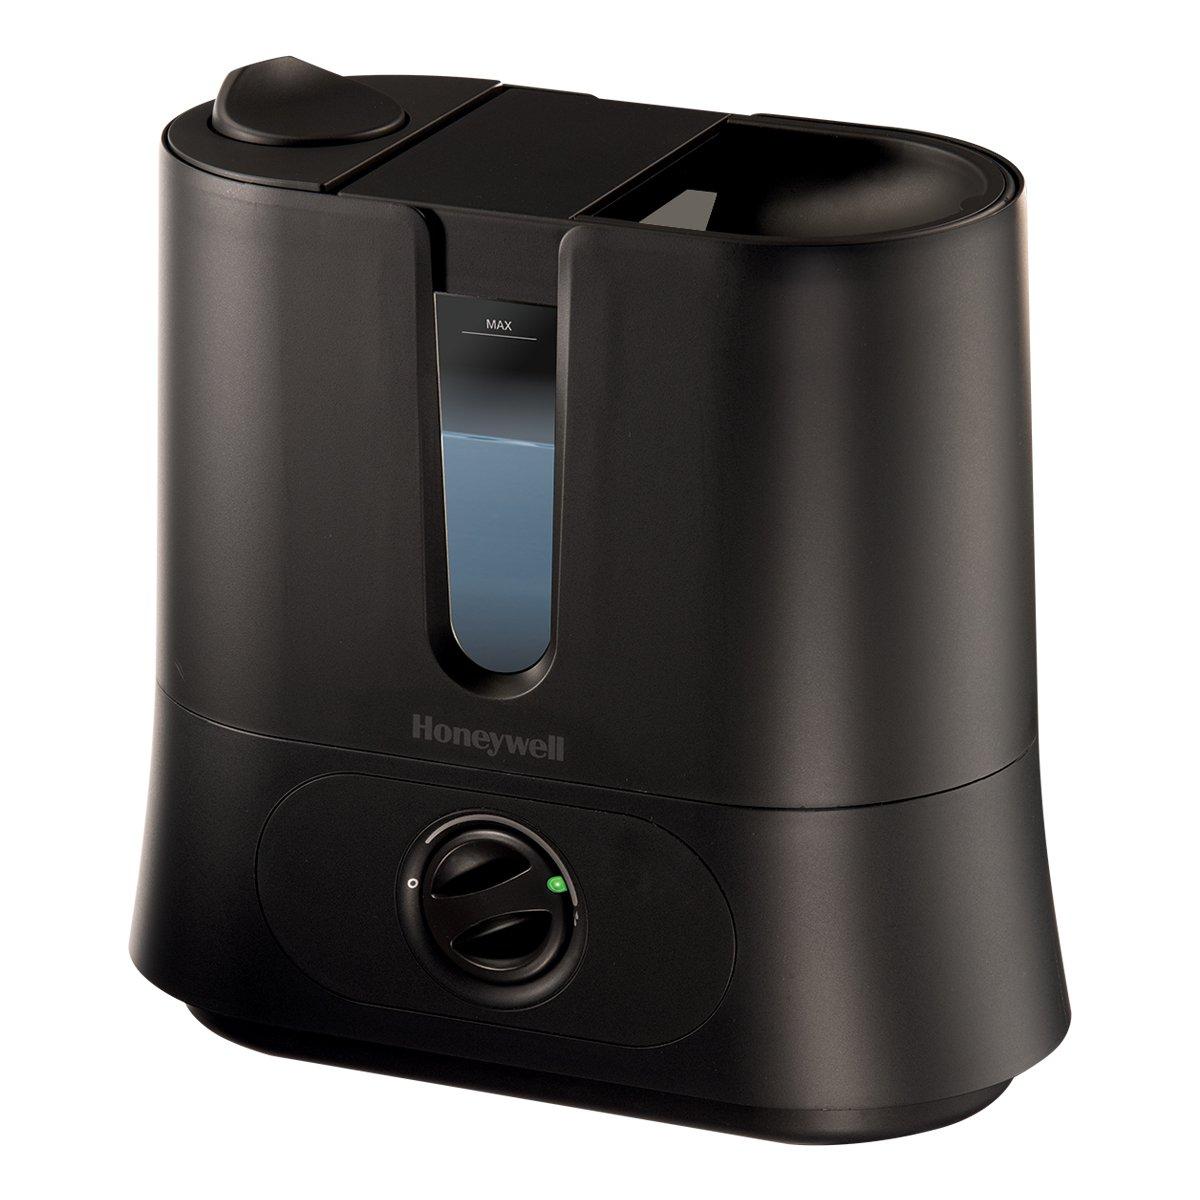 Honeywell Top Fill Cool Mist Humidifier